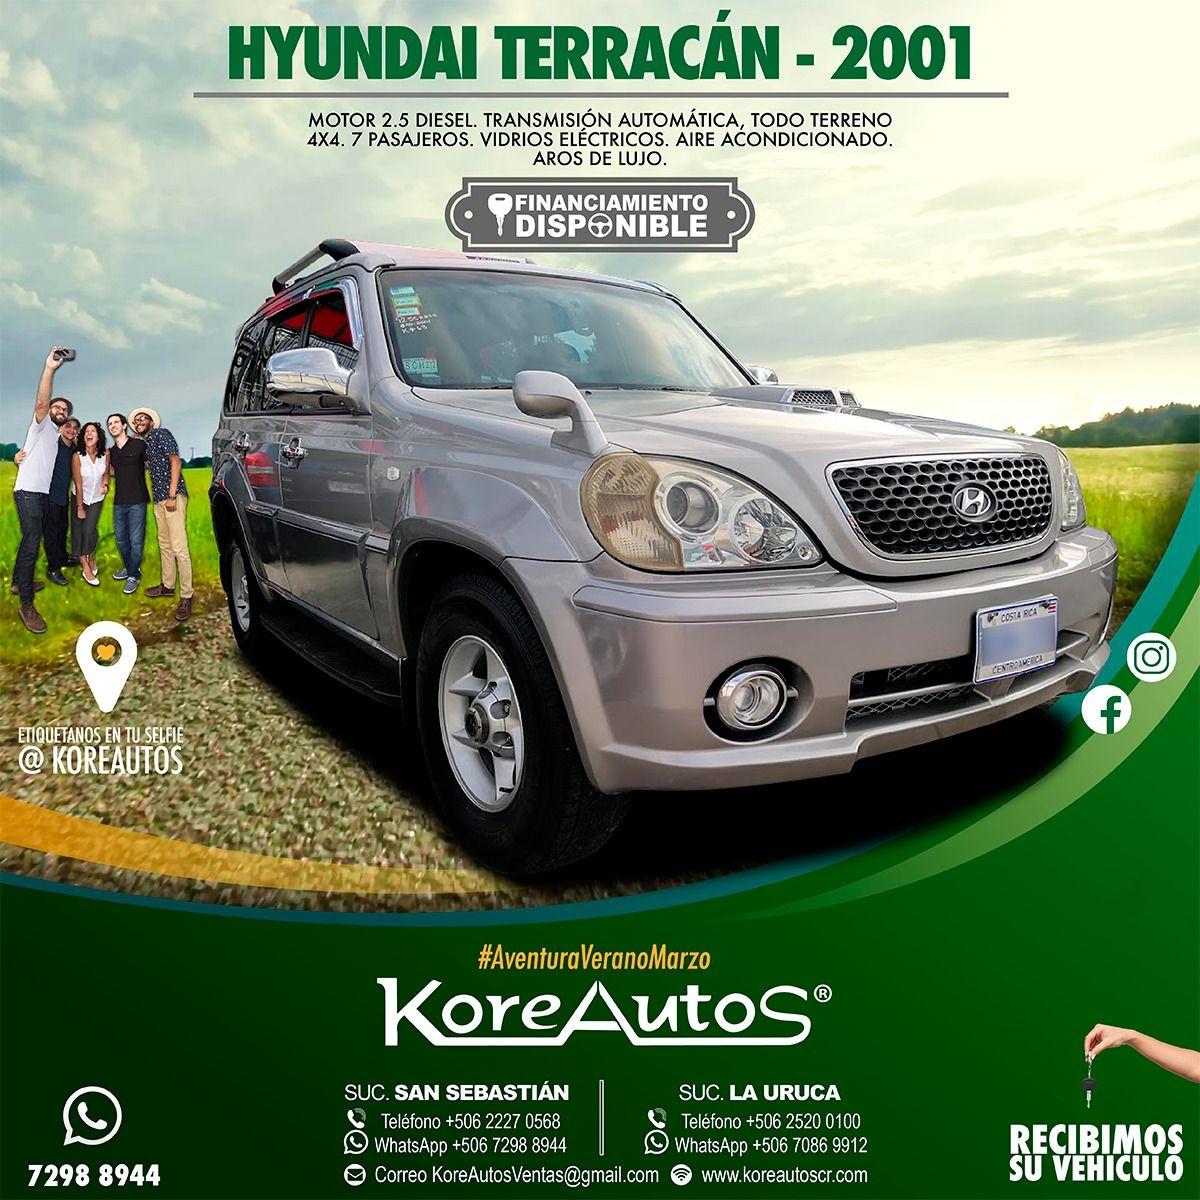 Hyundai (With images) Hyundai, Vehicles